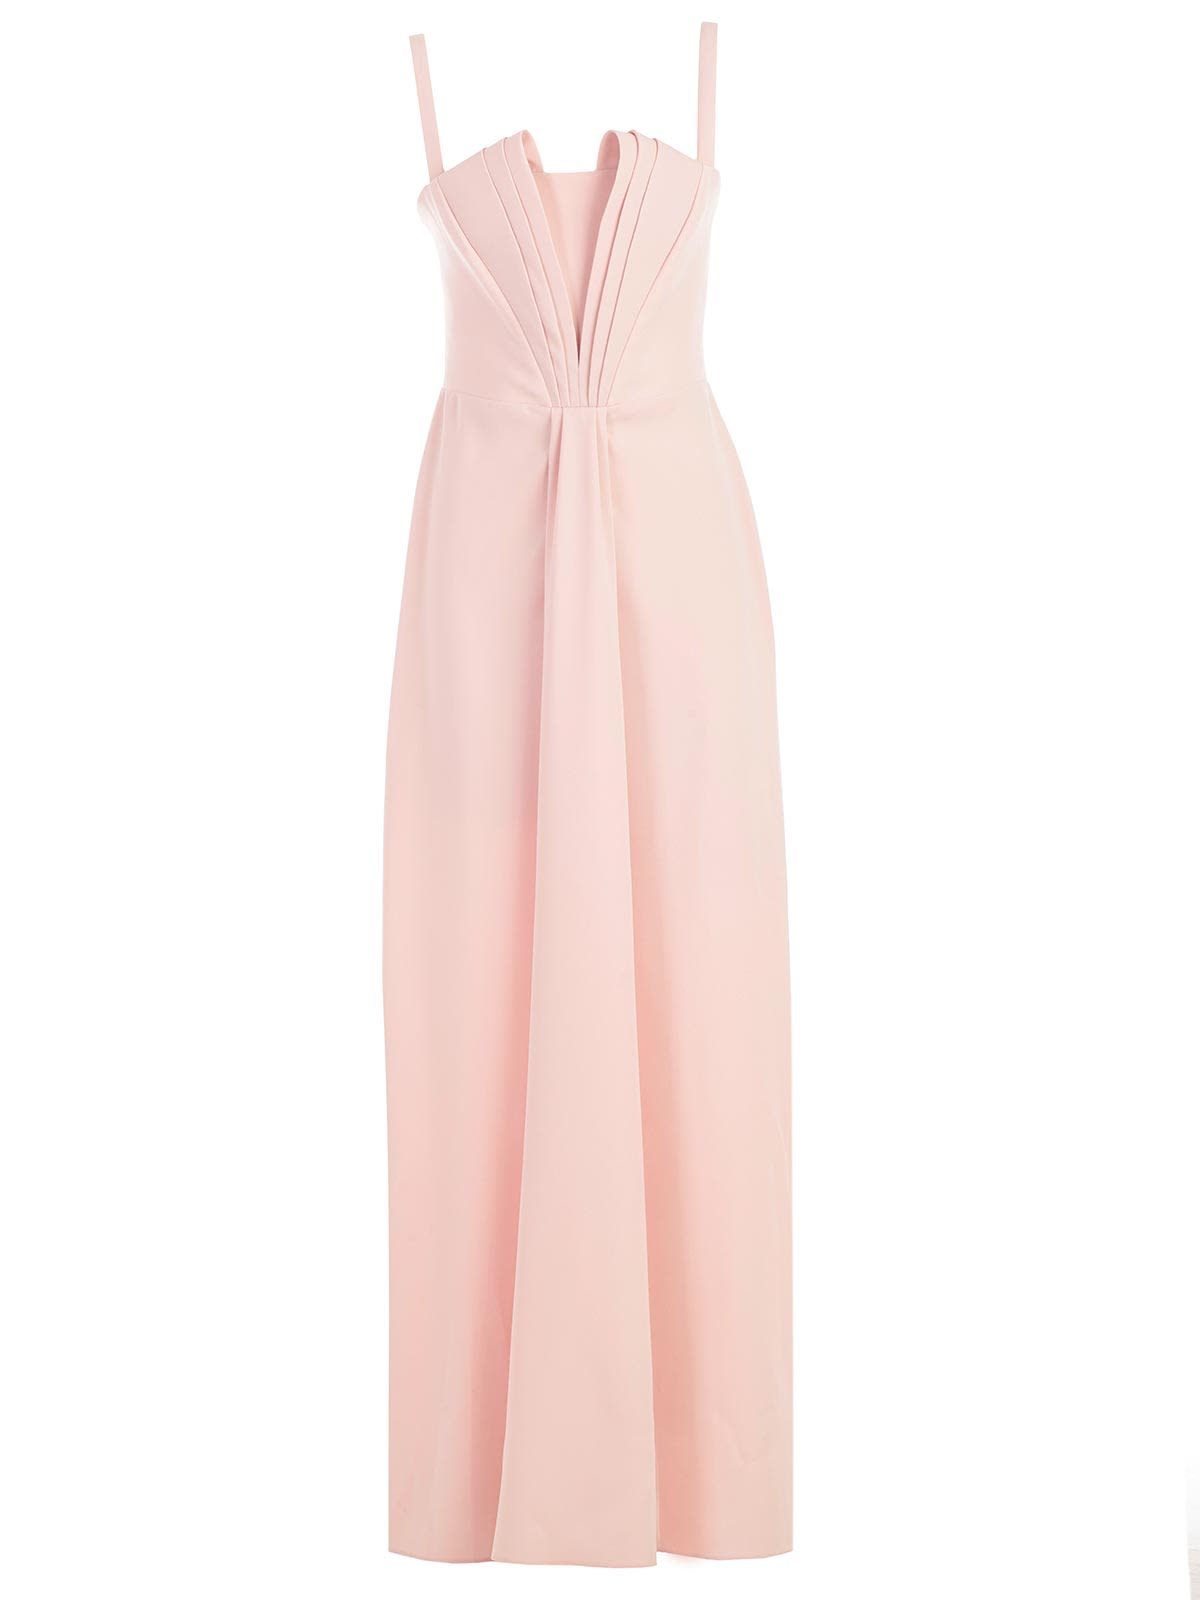 Dress Petticoat W/details